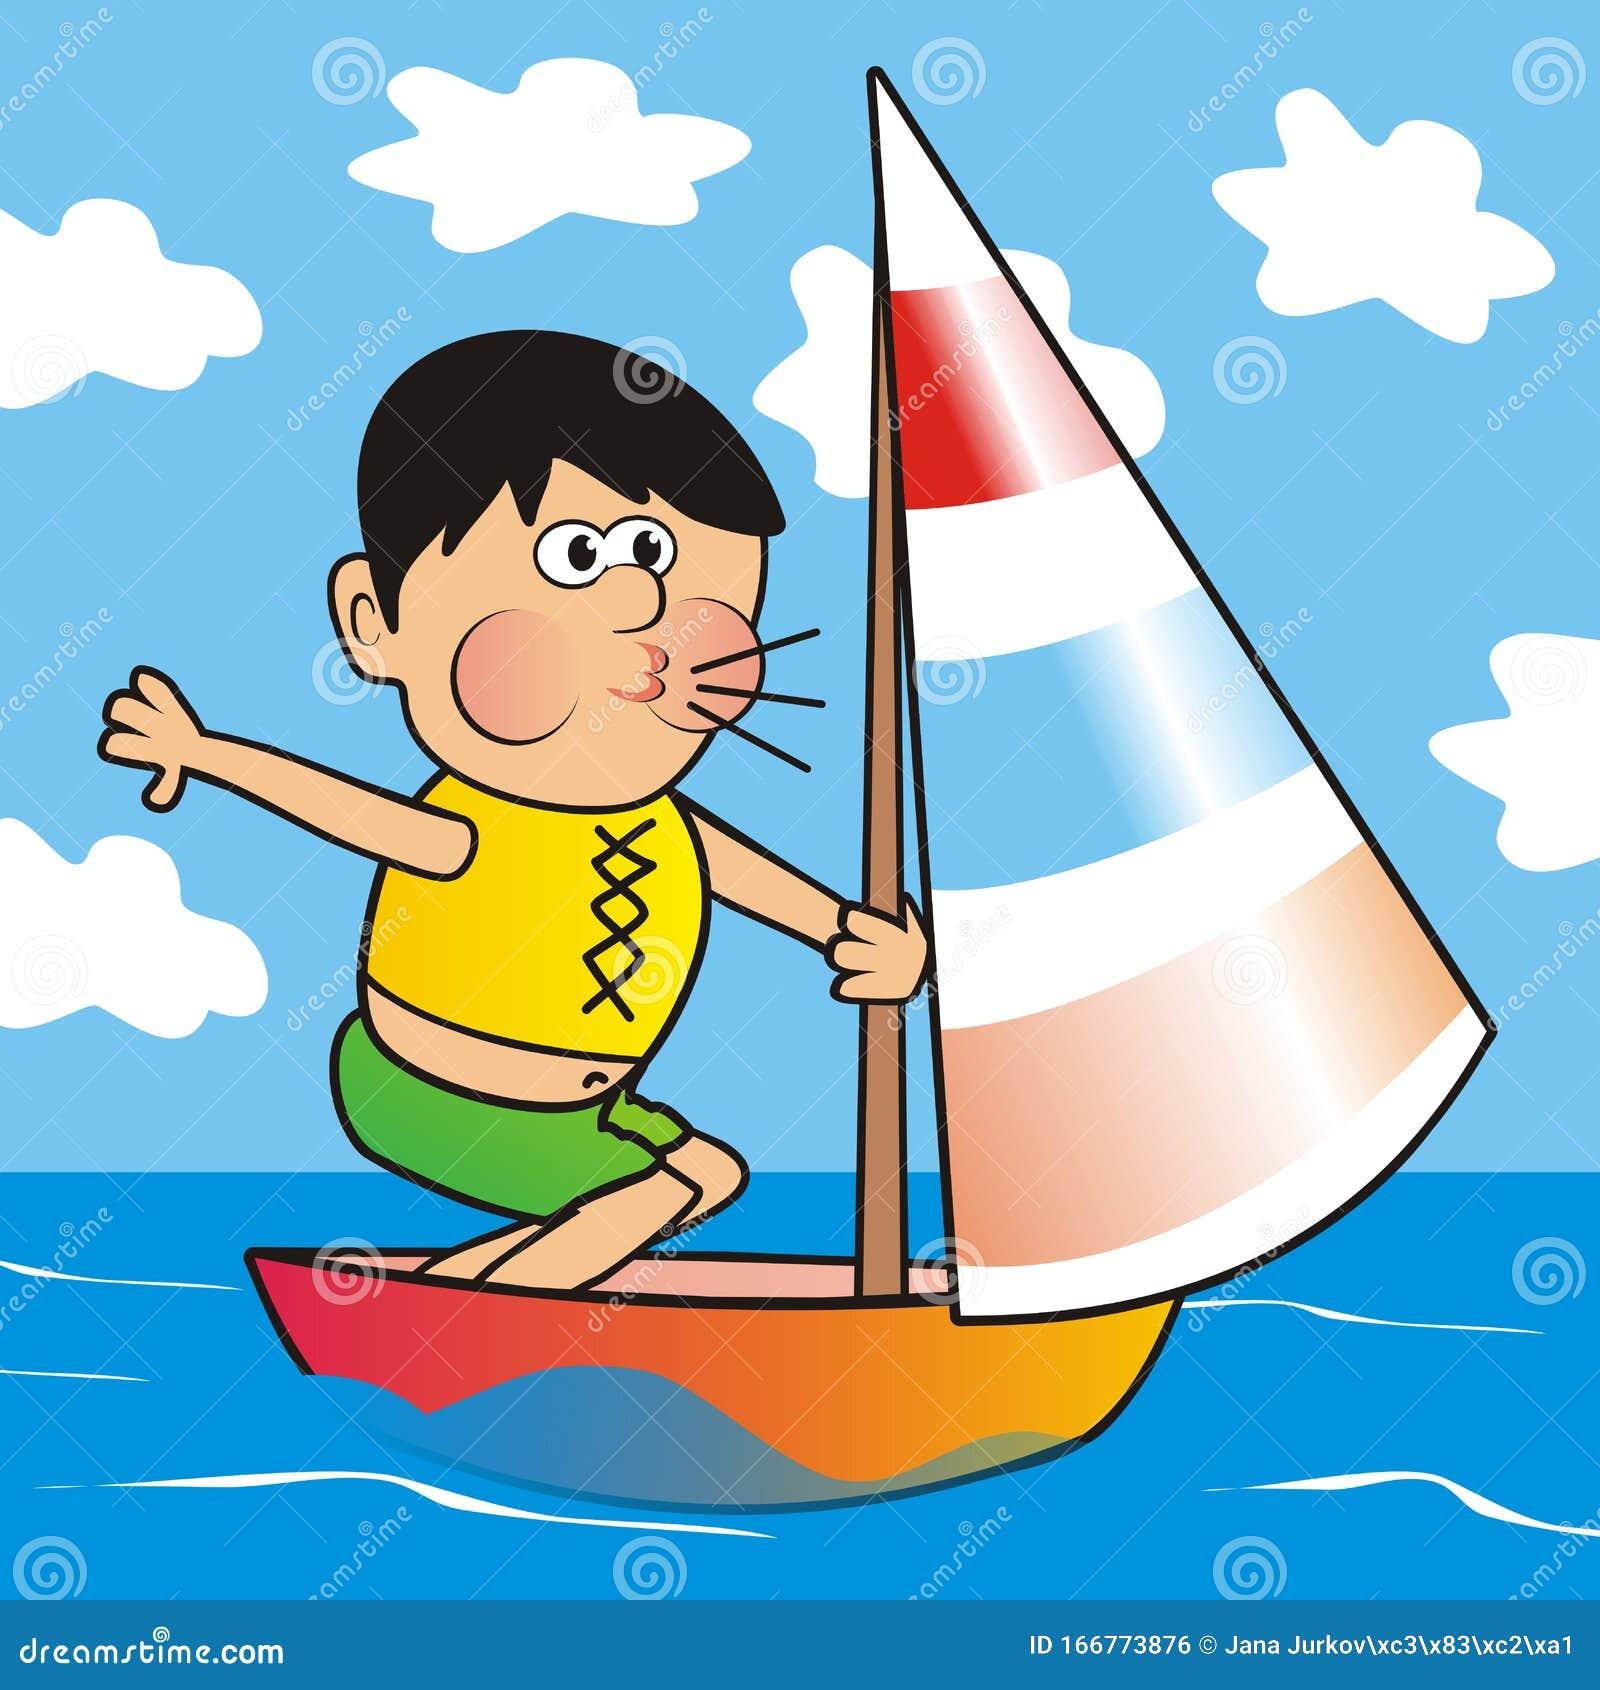 junge auf segelbooten lustige vektorgrafik vektor